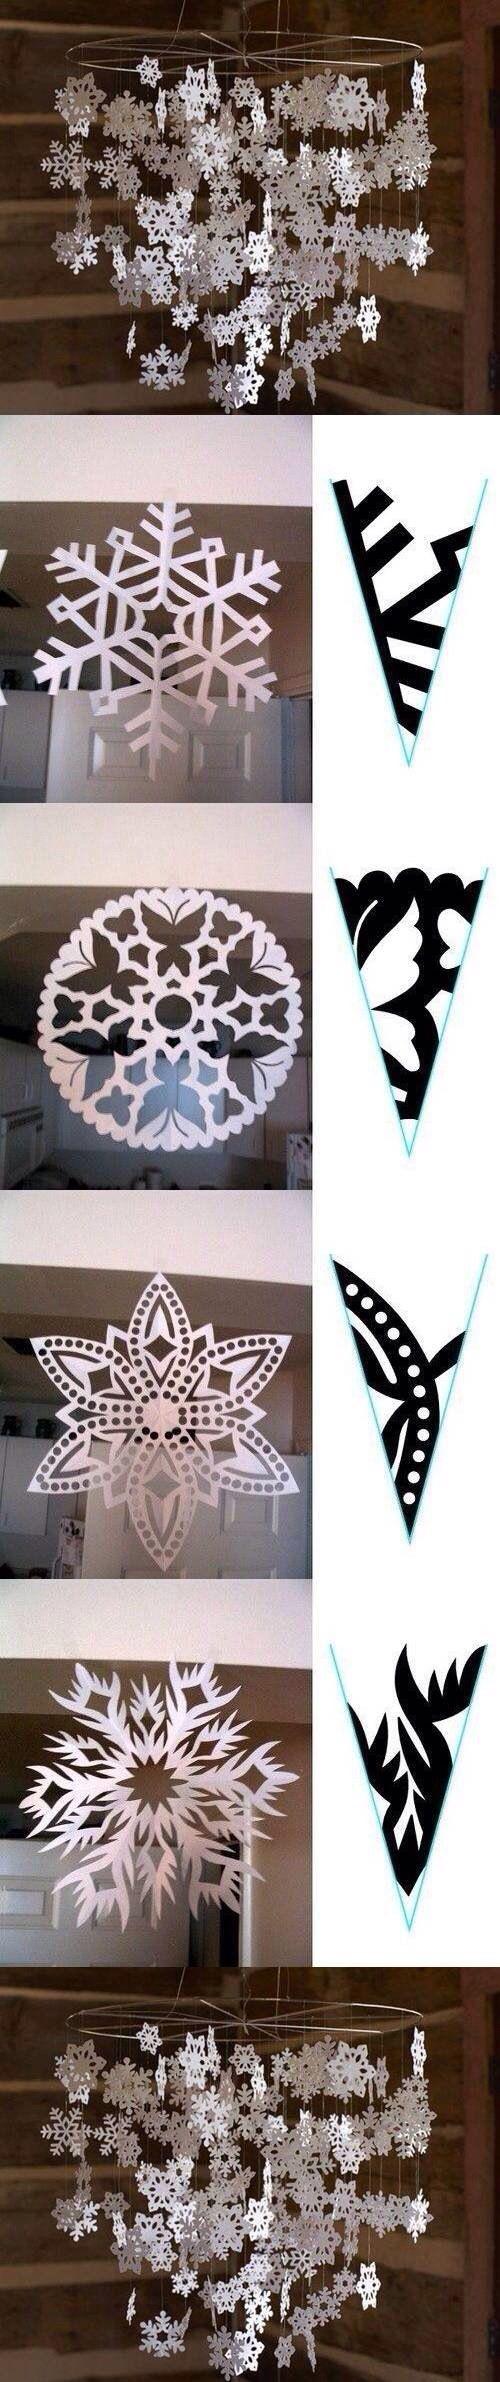 Cut paper patterns